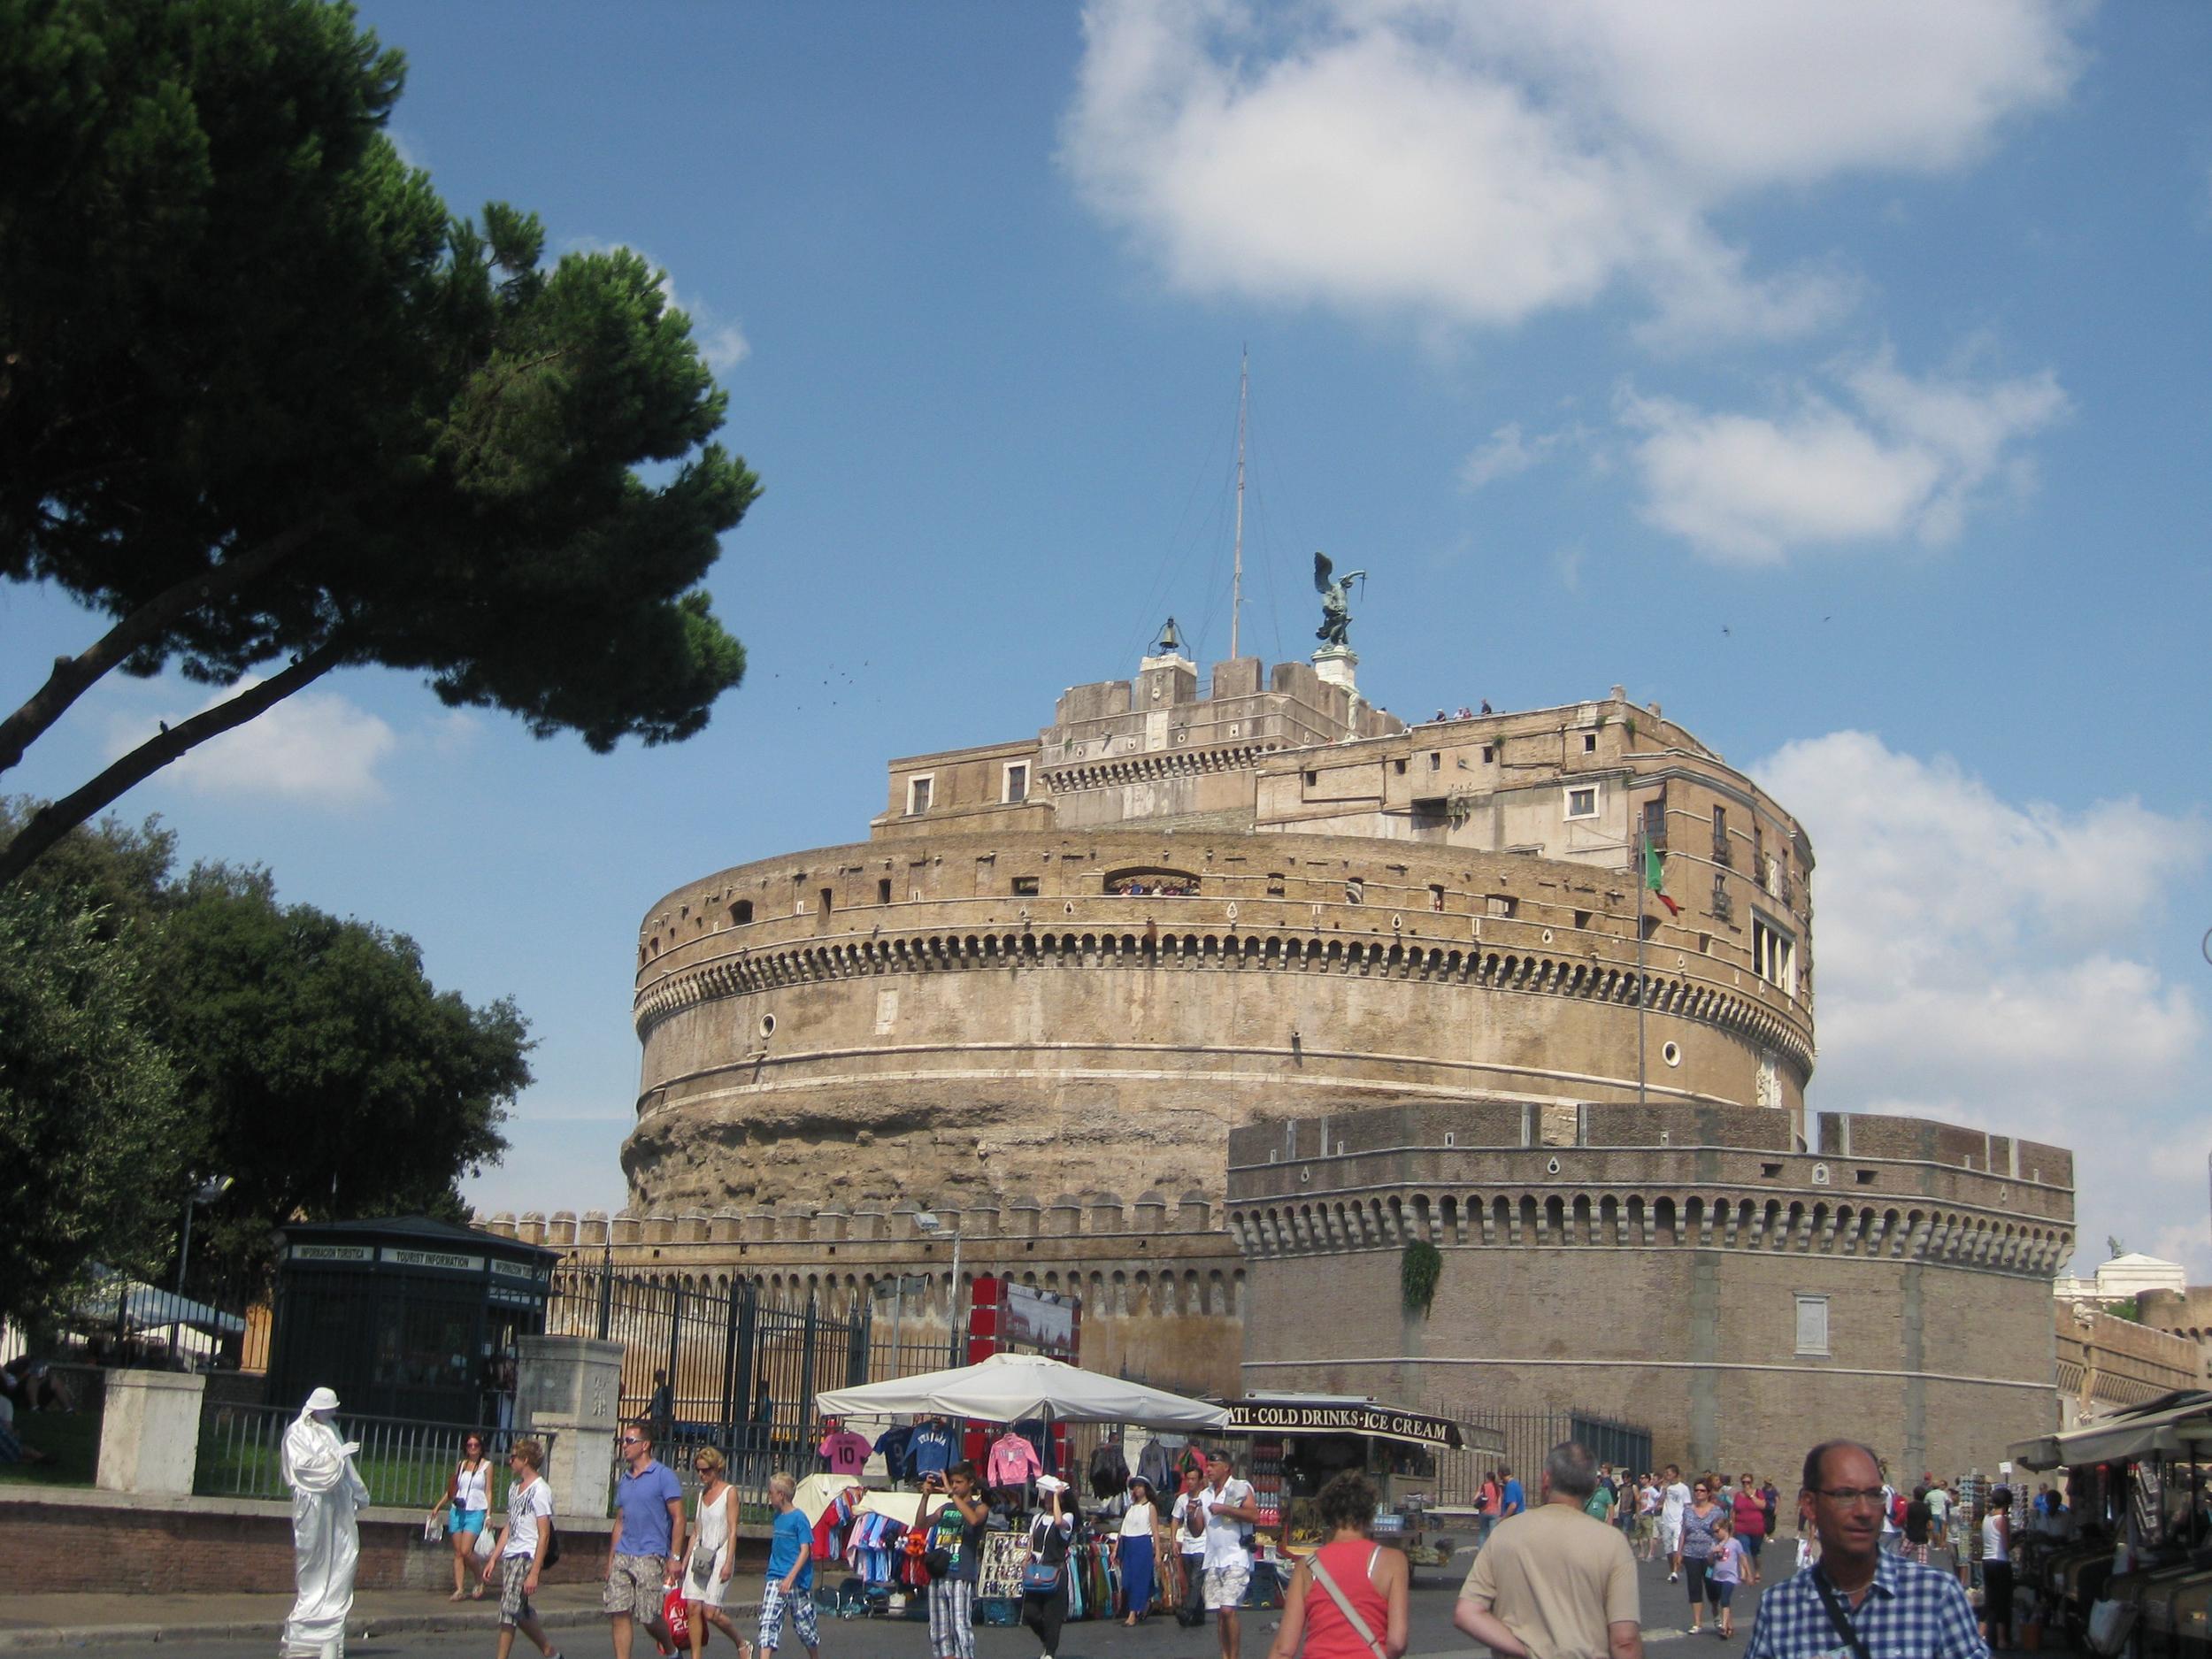 CRO Italy web 2012 - 67.jpg